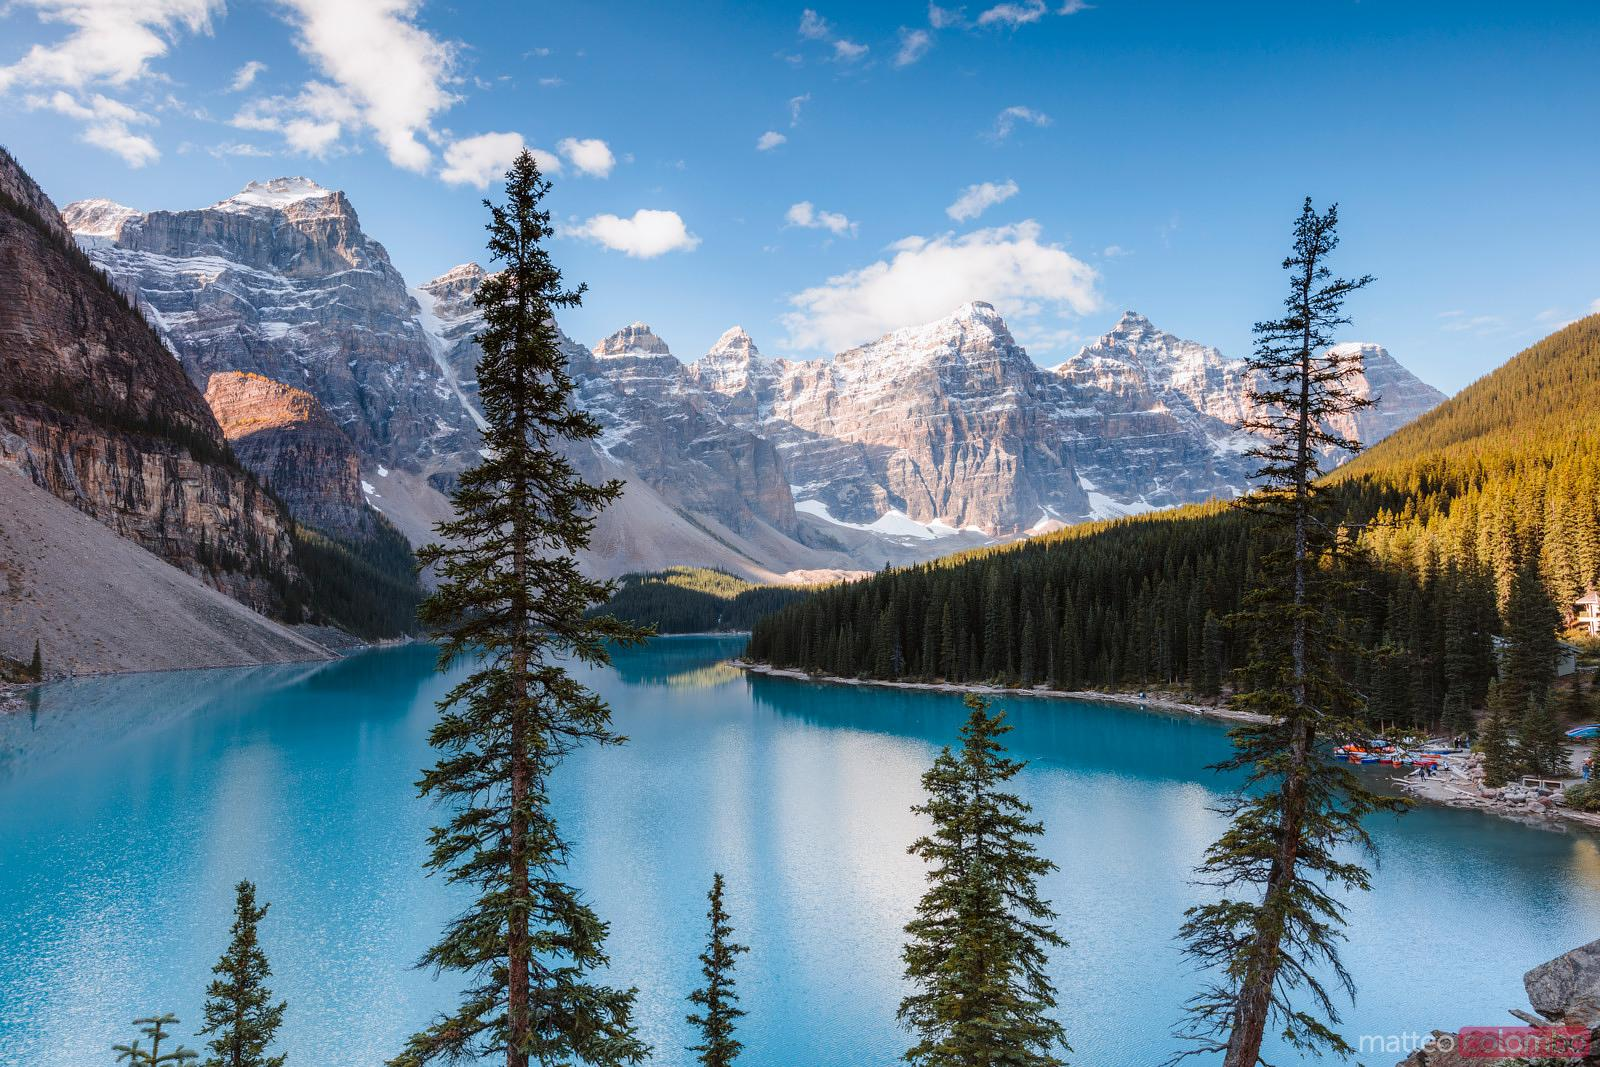 Matteo Colombo Travel Photography Moraine Lake Banff